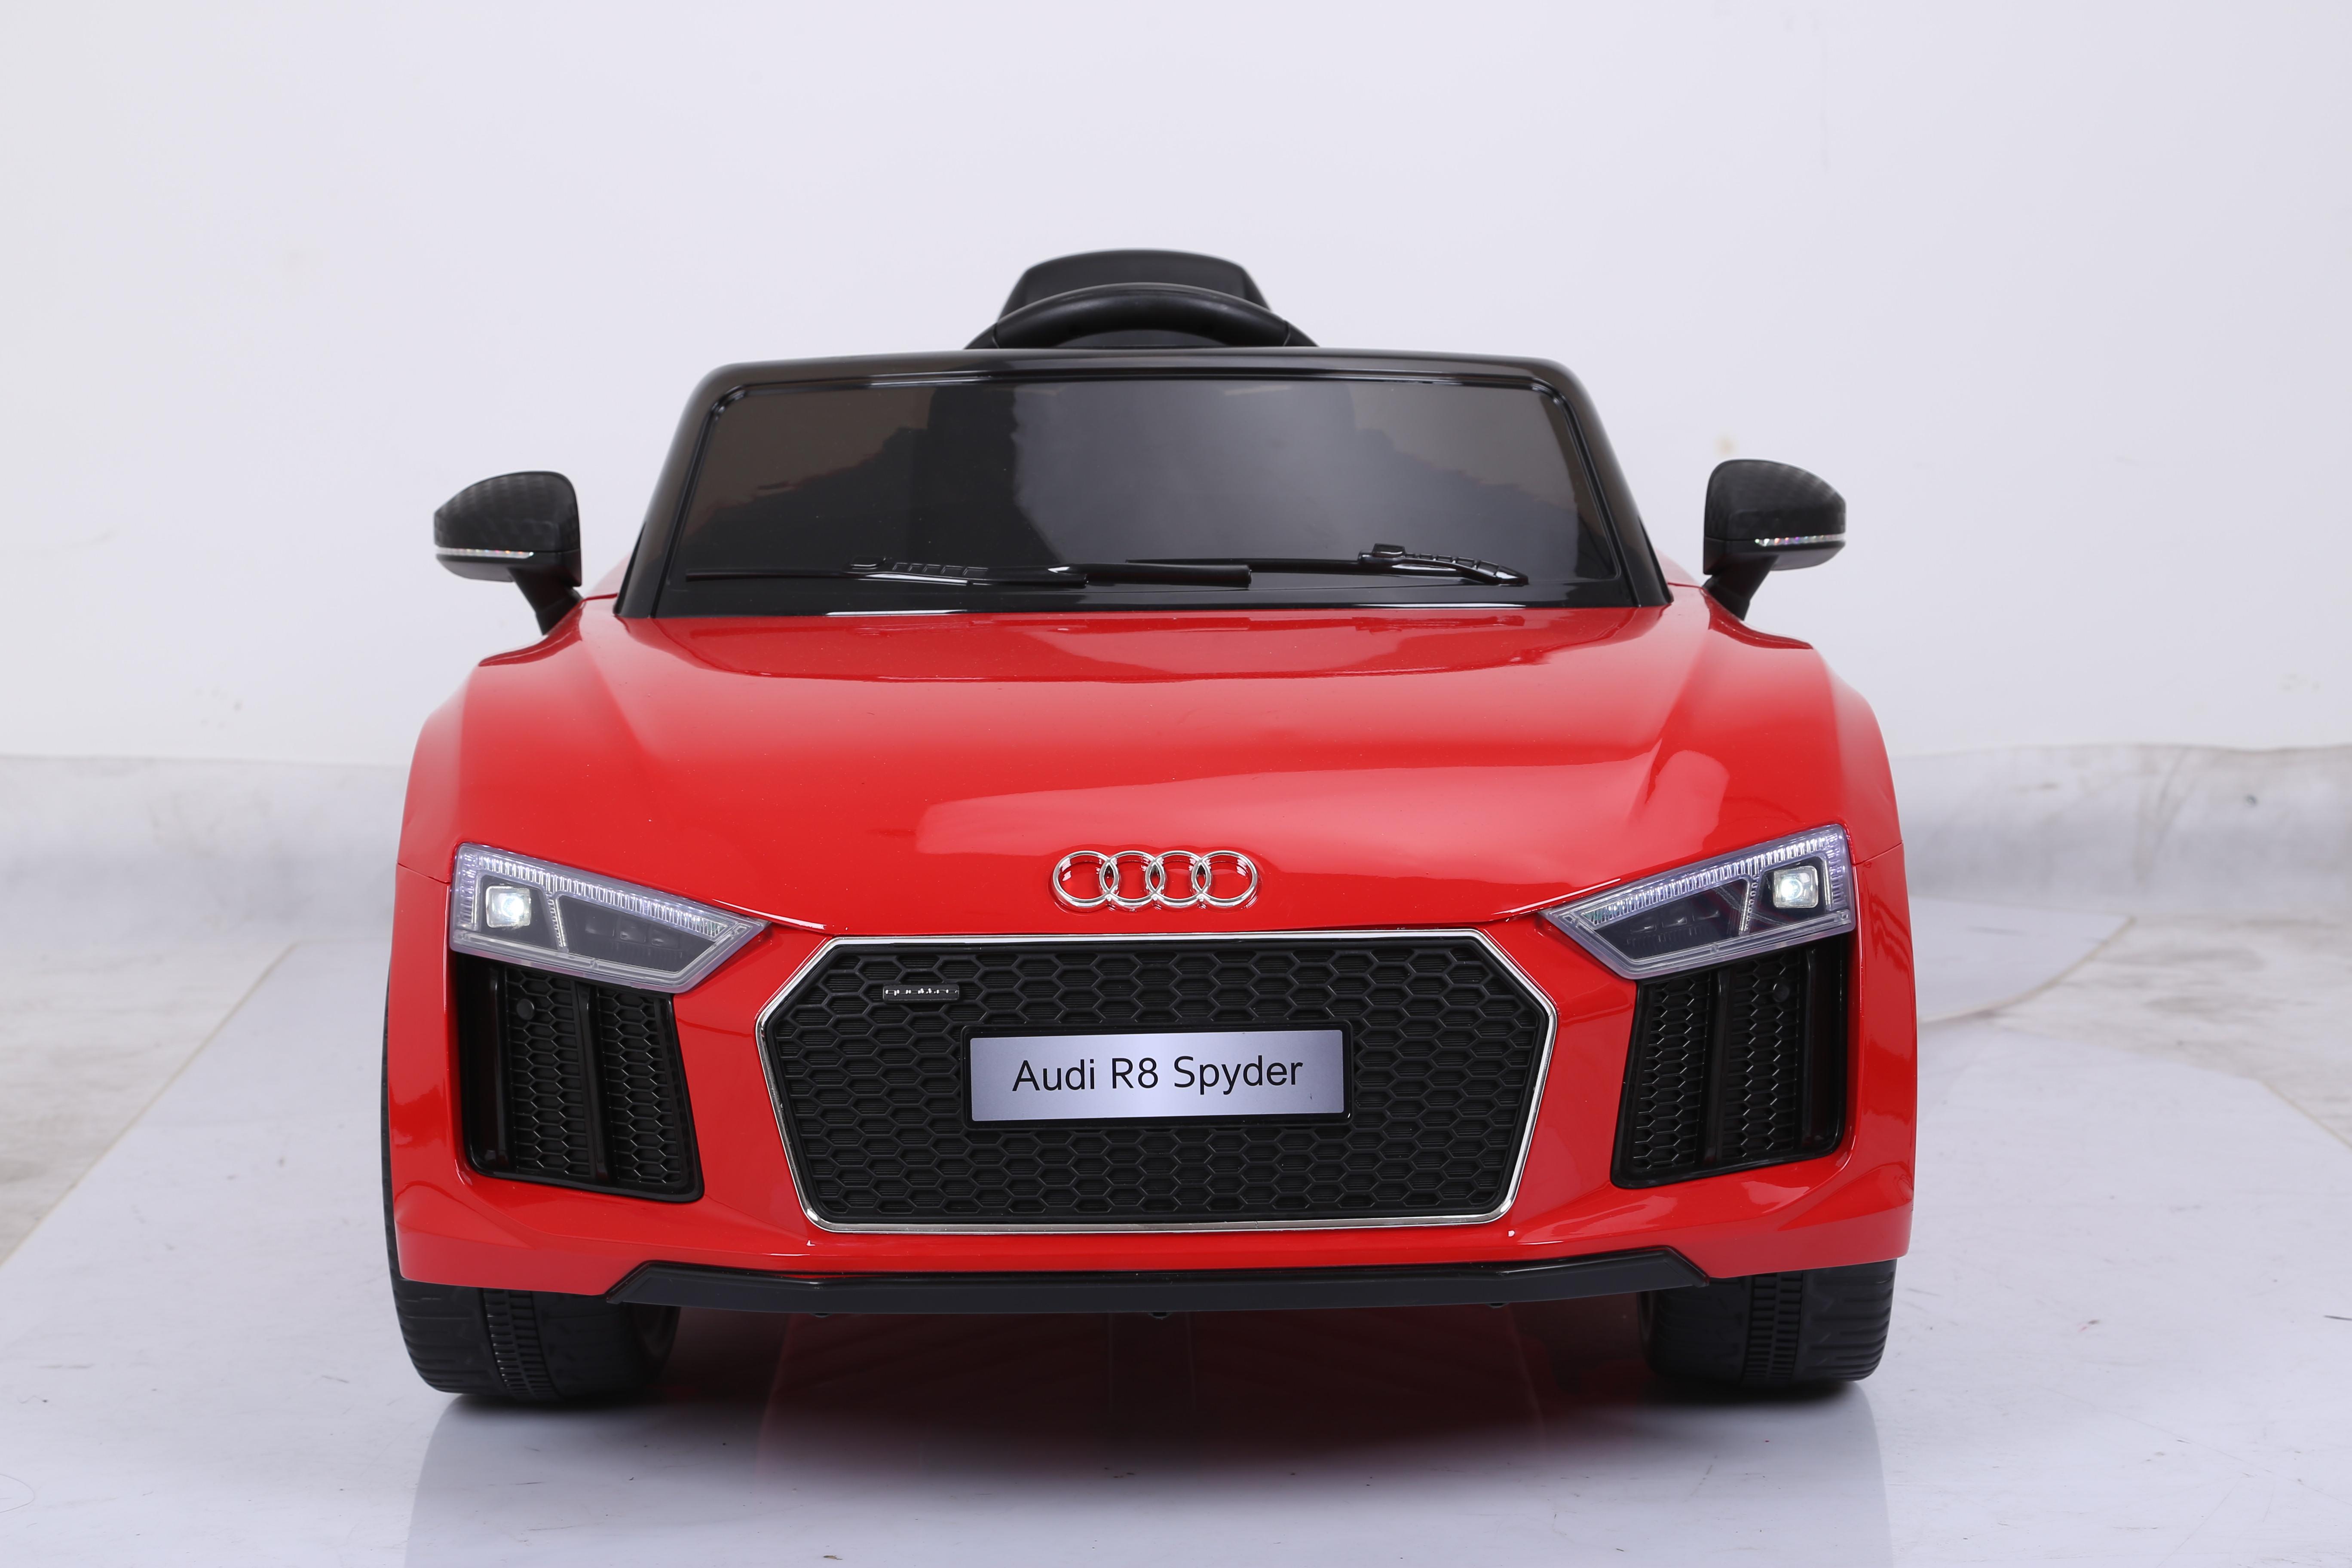 Audi R8 Licensed Kids Ride On Car 12v Remote Control Cars